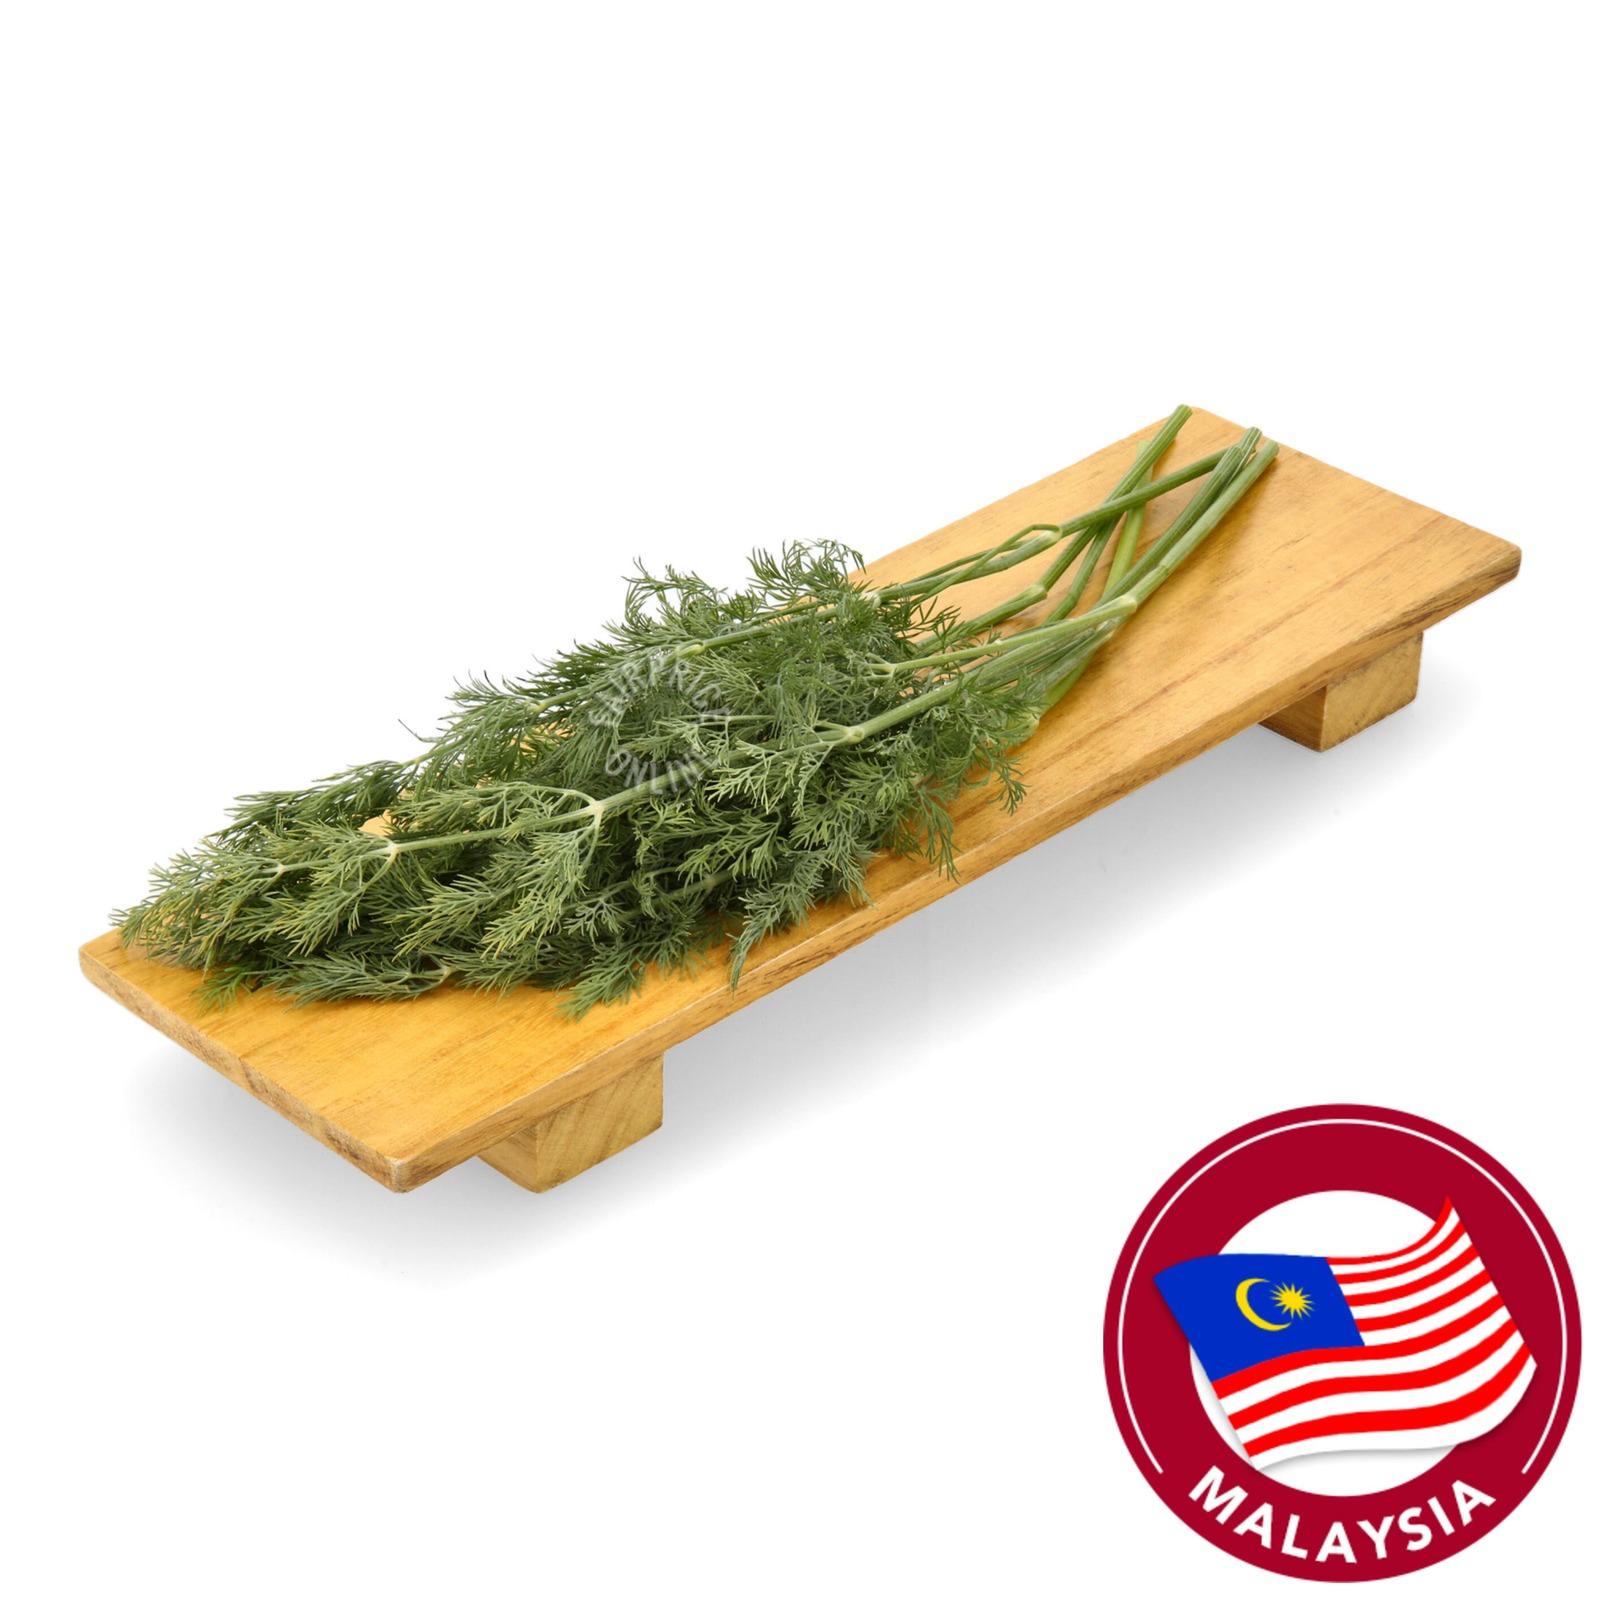 Live Well Fresh Herbs - Dill